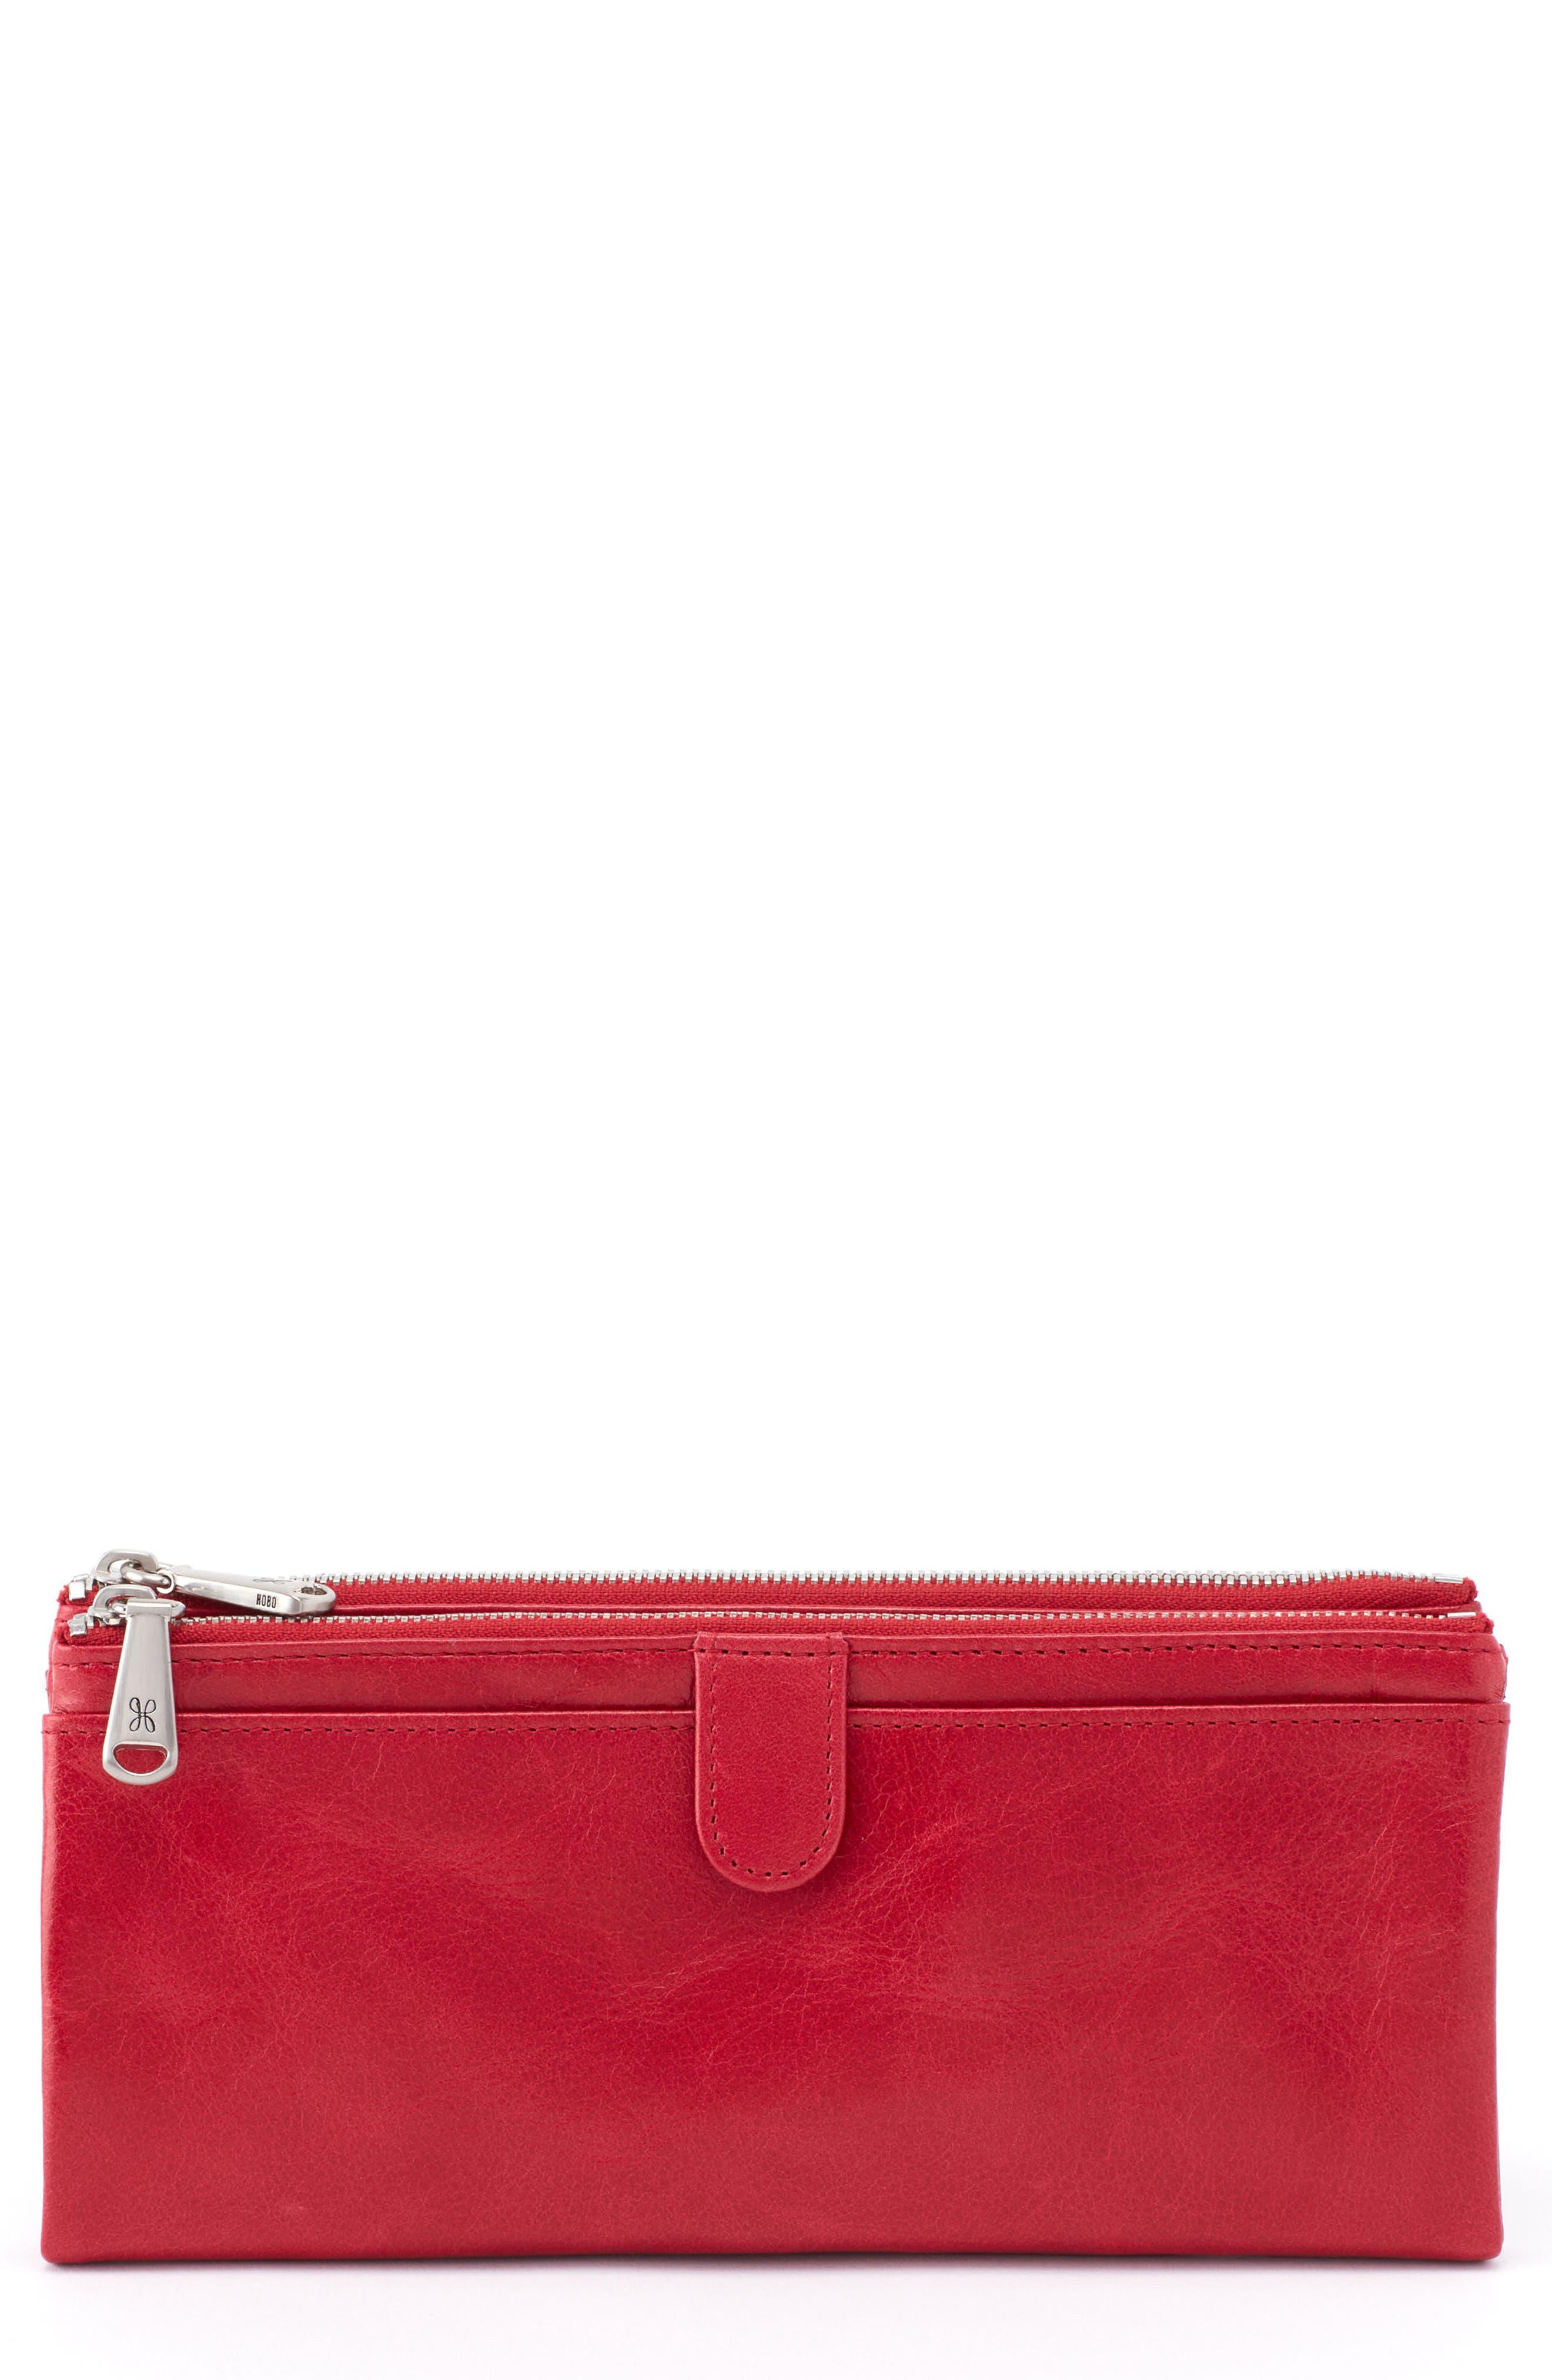 Hobo 'Taylor' Glazed Leather Wallet